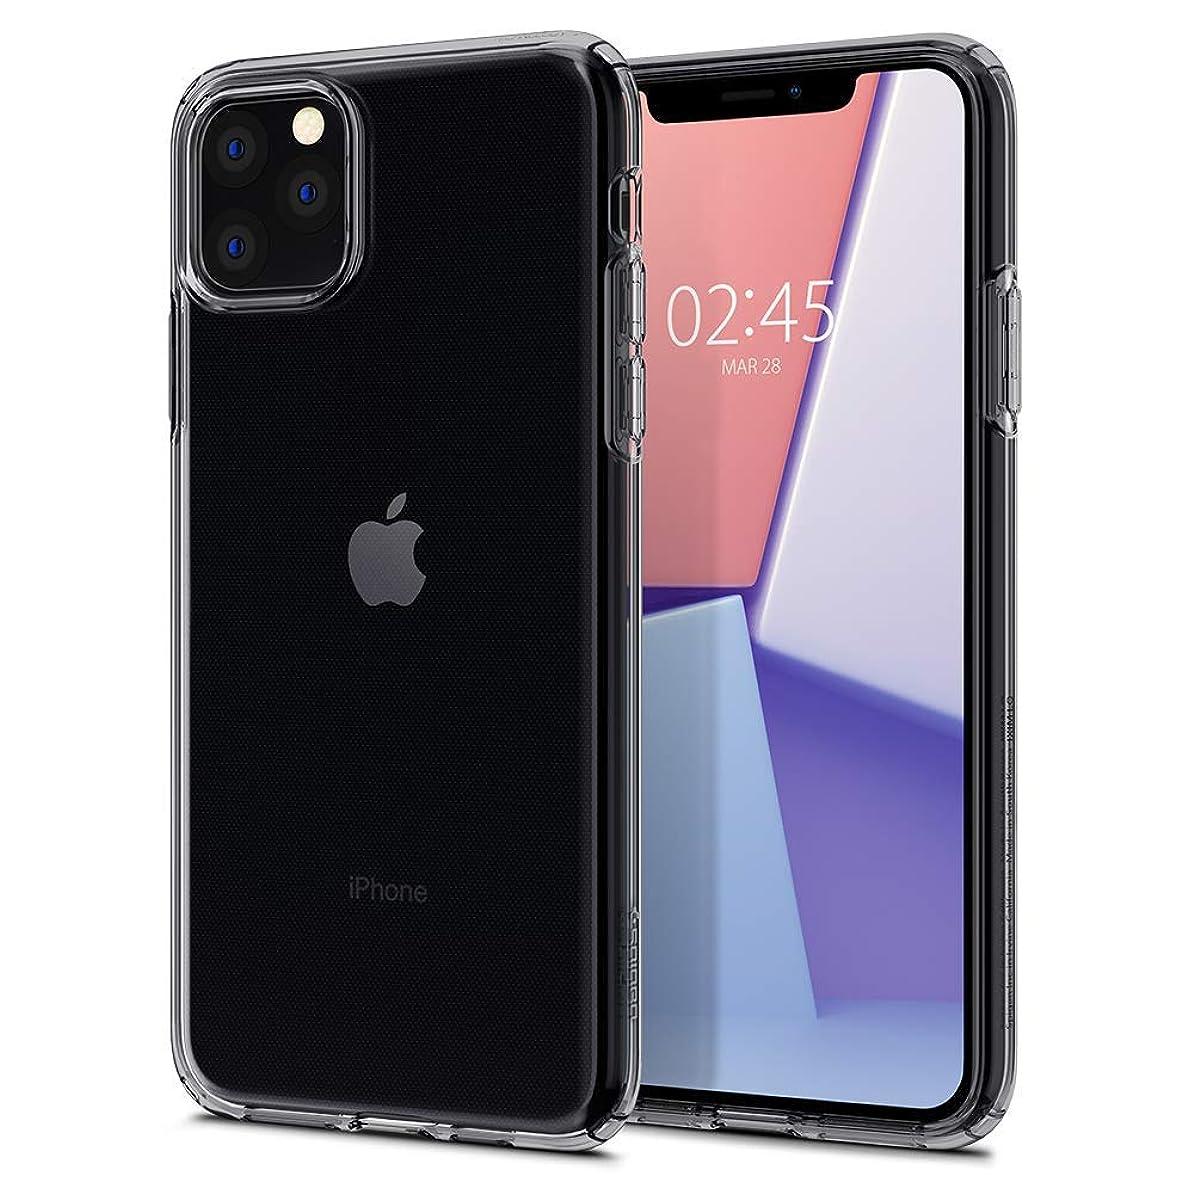 【Spigen】 iPhone 11 Pro Max ケース 6.5インチ 対応 TPU 傷防止 レンズ保護 超薄型 超軽量 Qi充電 ワイヤレス充電 クリア リキッド?クリスタル 075CS27130 (スペース?クリスタル)